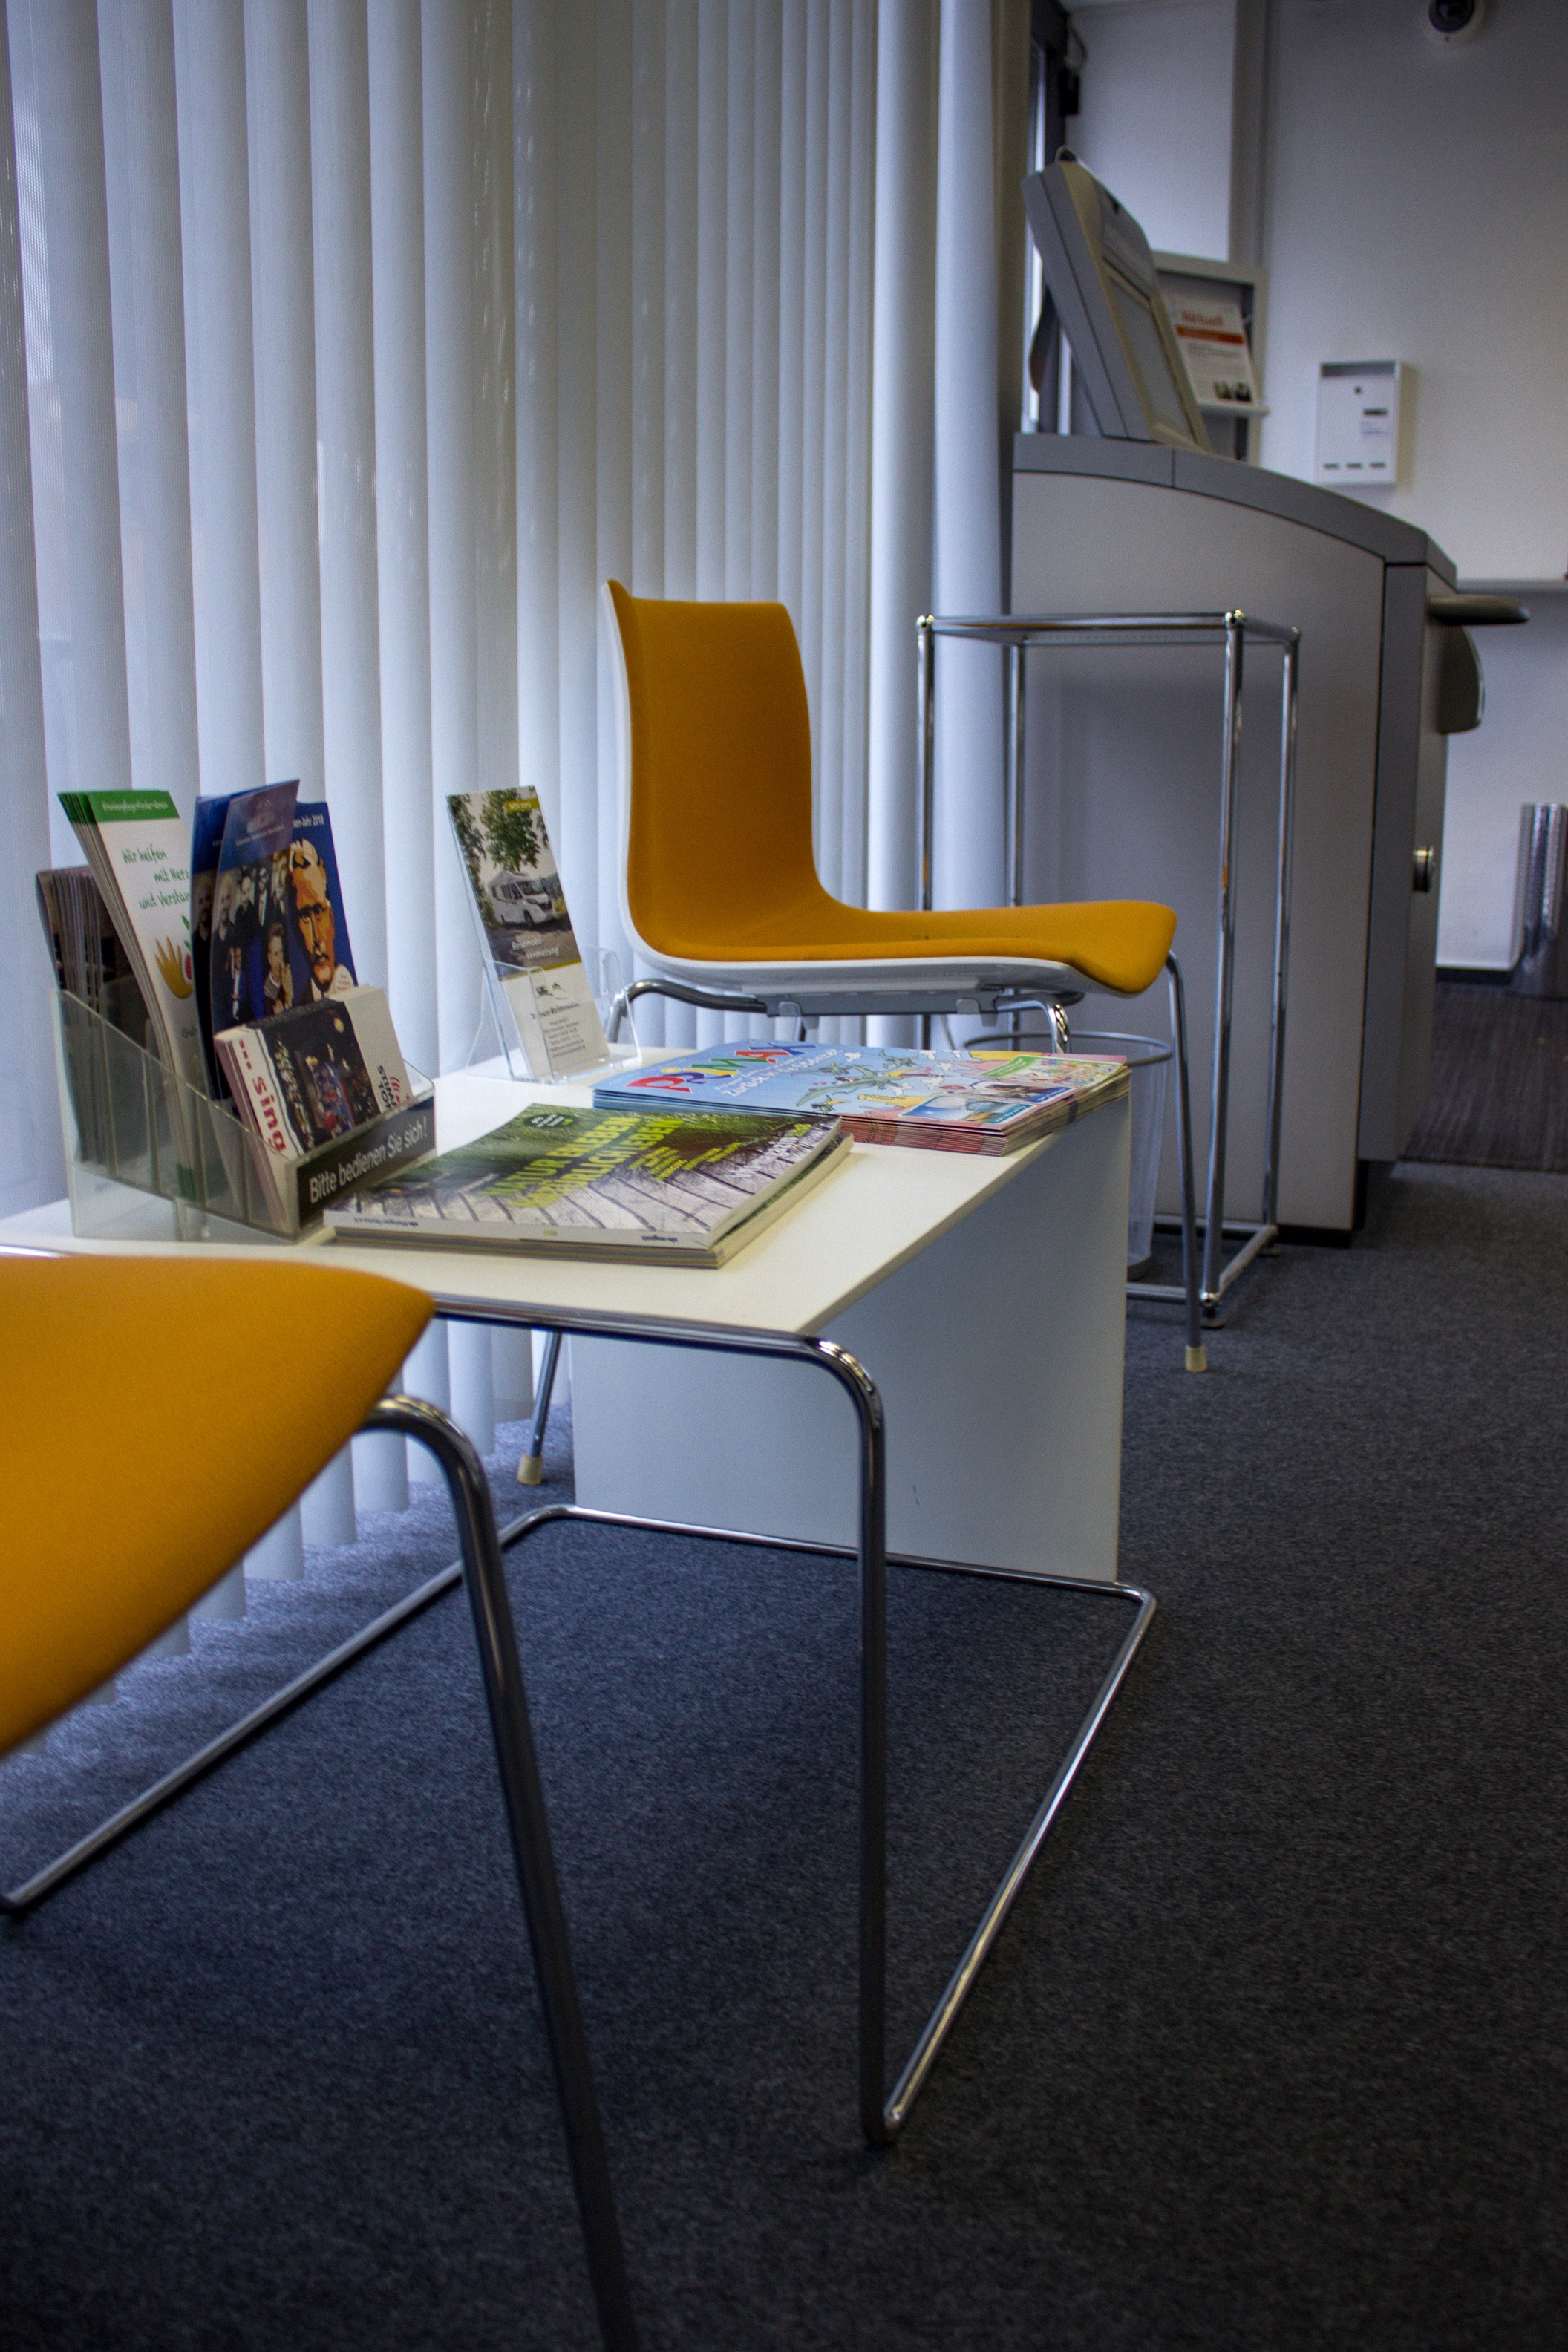 Fotos de vr bank Untertaunus eG, Filiale Wallrabenstein